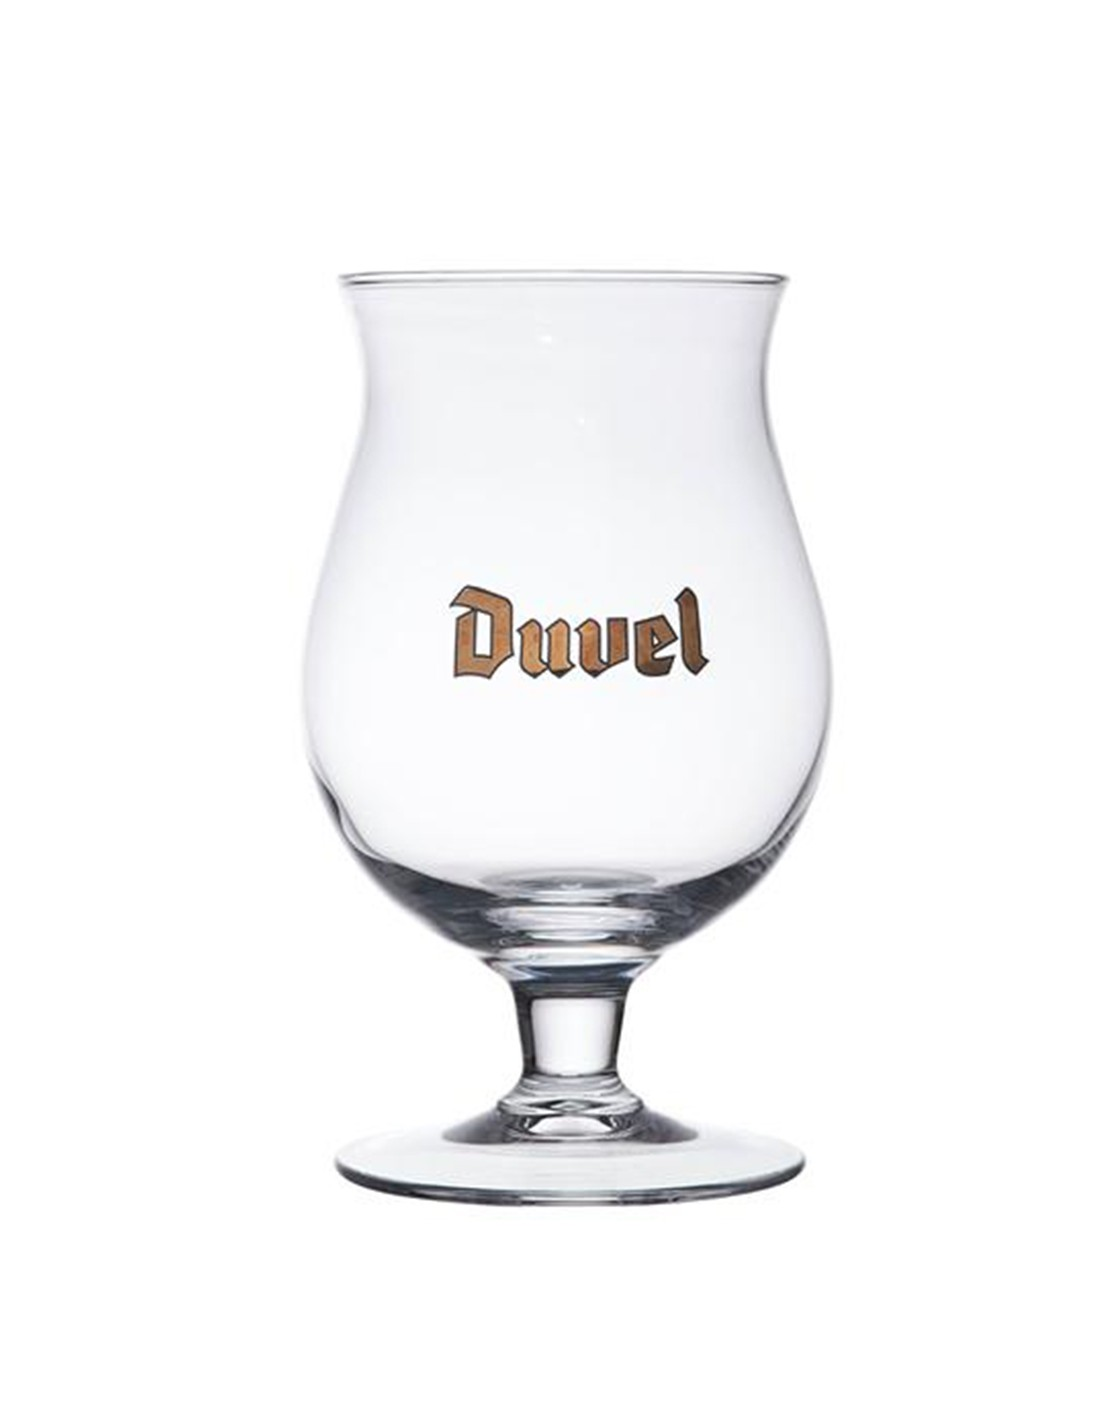 Pahar Duvel, 0.33L, Belgia